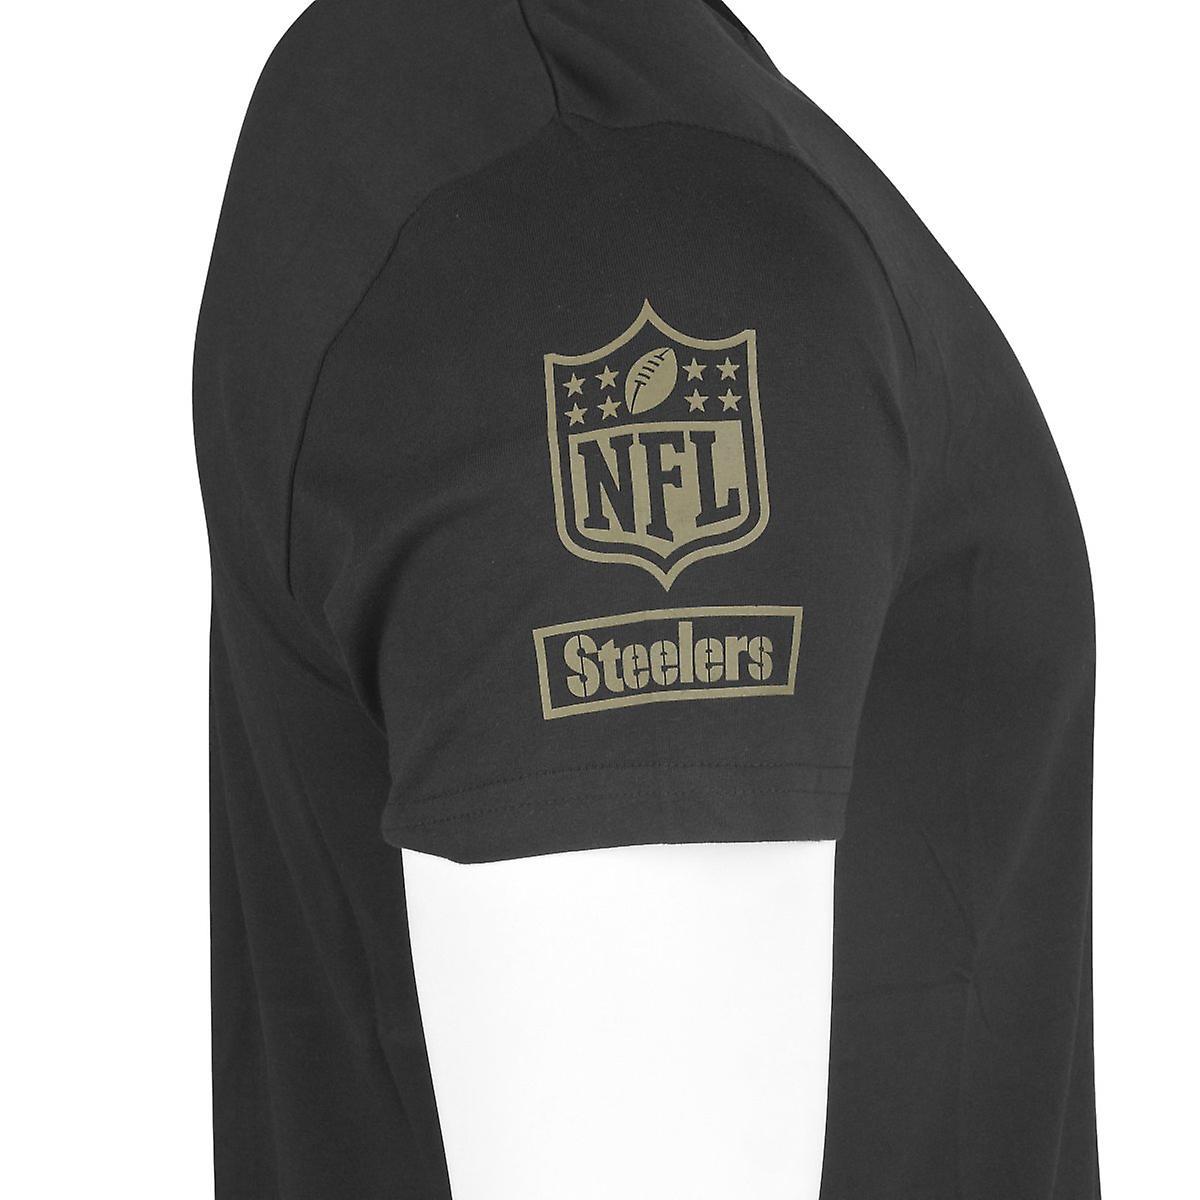 the best attitude 19ba1 260a8 New era Camo shirt - NFL Pittsburgh Steelers Black